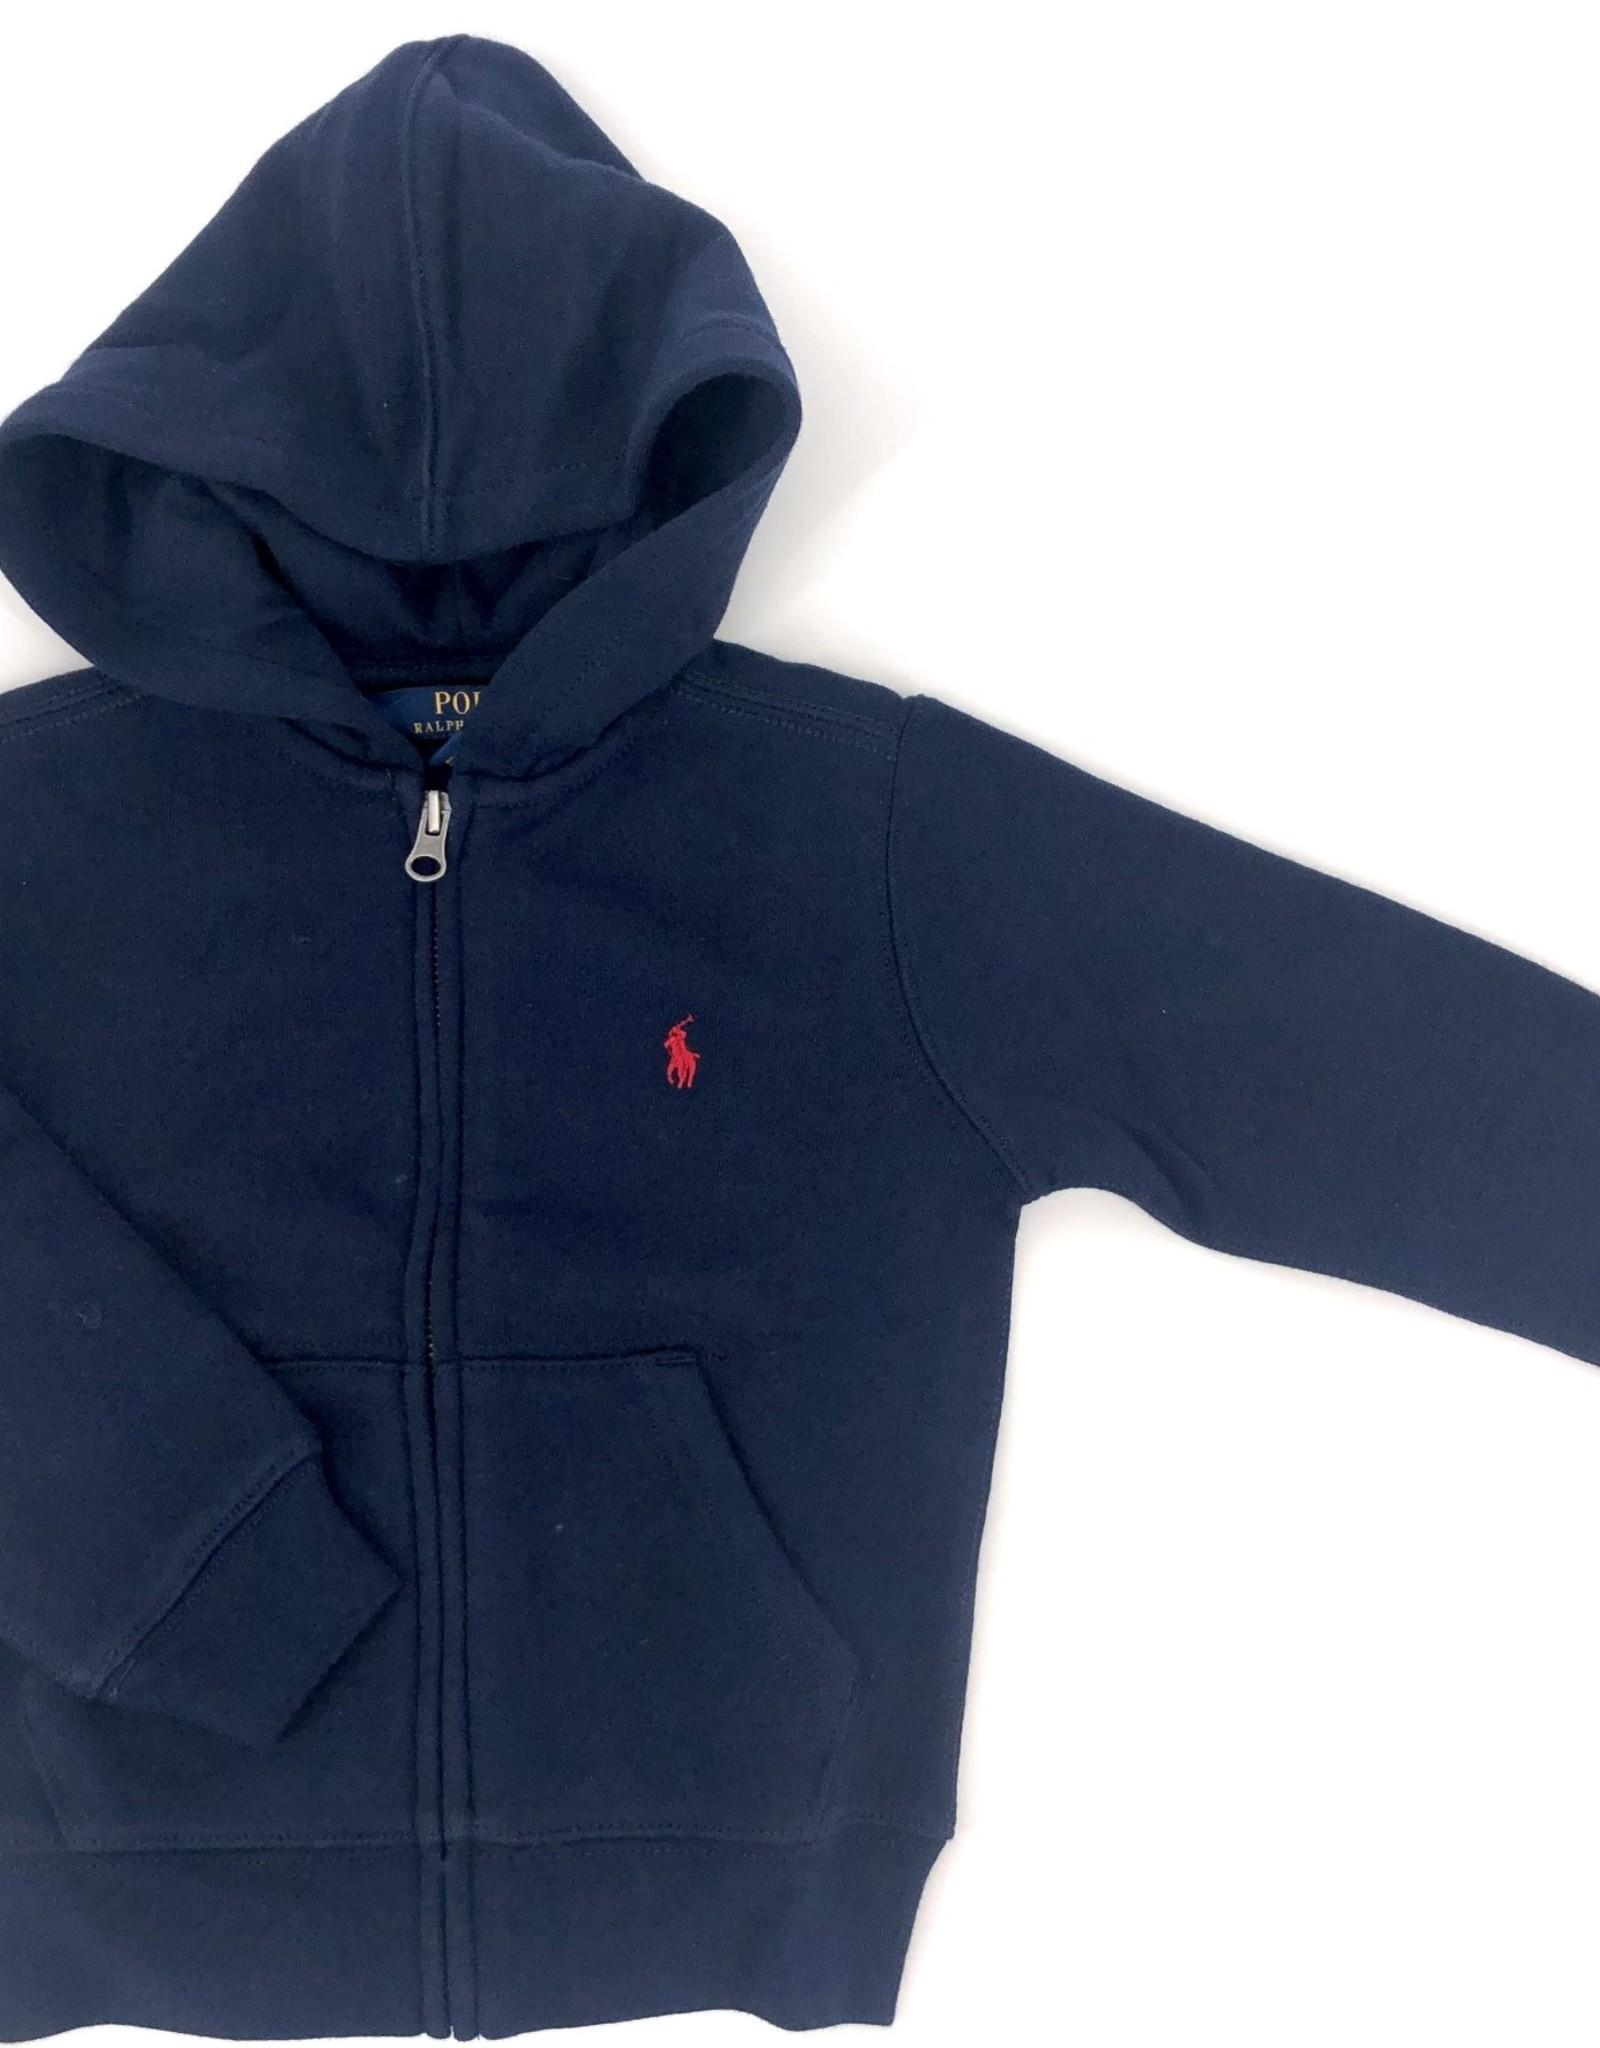 RALPH LAUREN RALPH LAUREN Sweater blauw kap